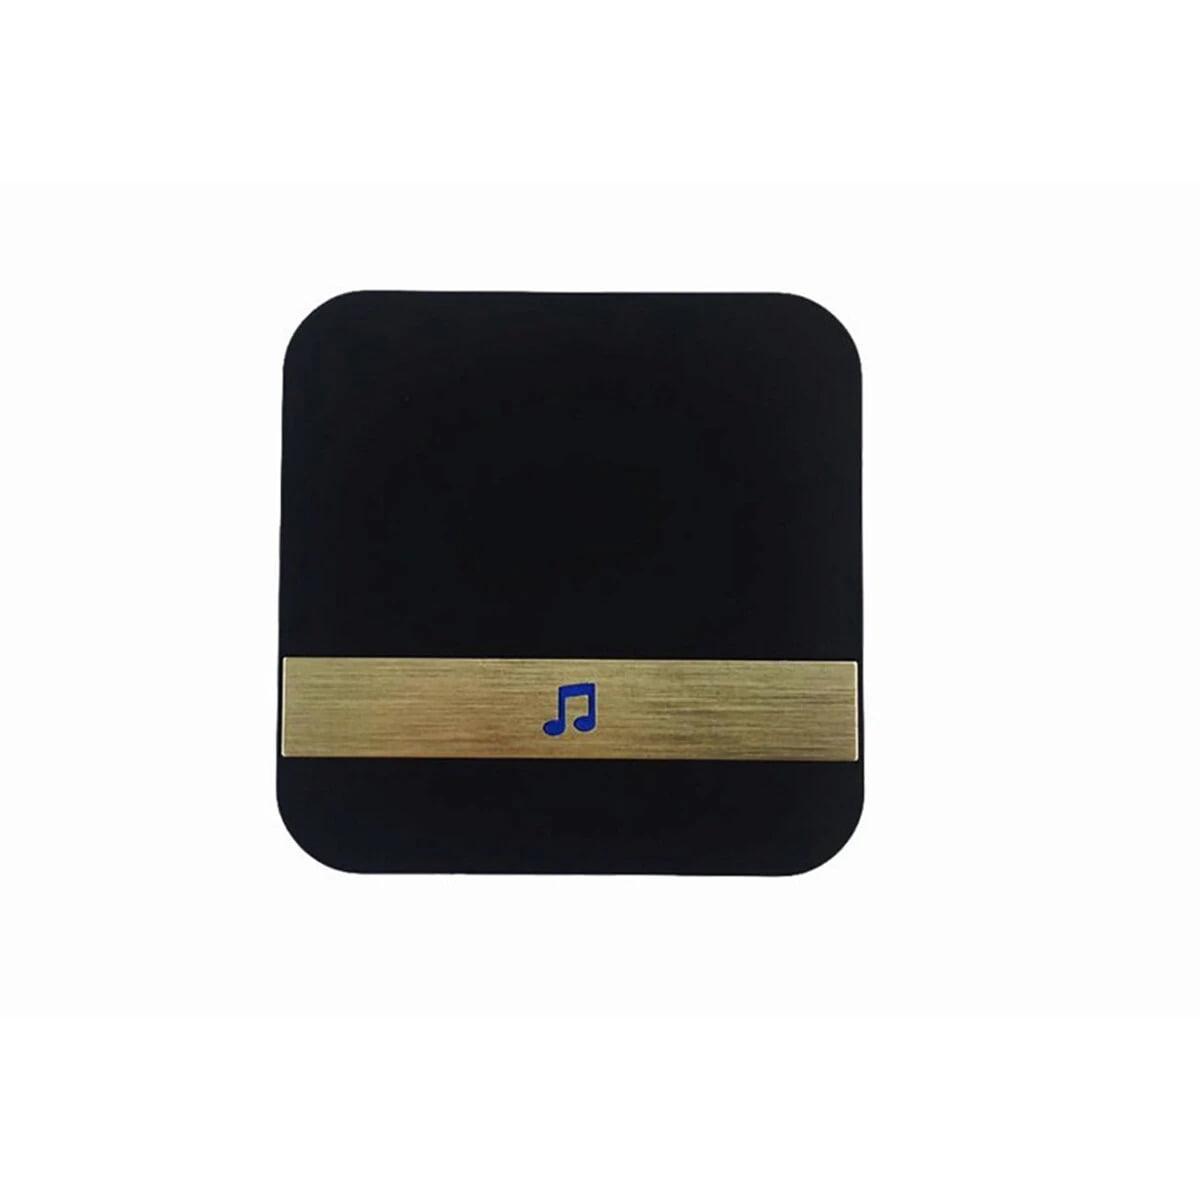 SH01 1080P HD Wireless Wifi Smart Doorbell Camera PIR Bell Security Home (14)